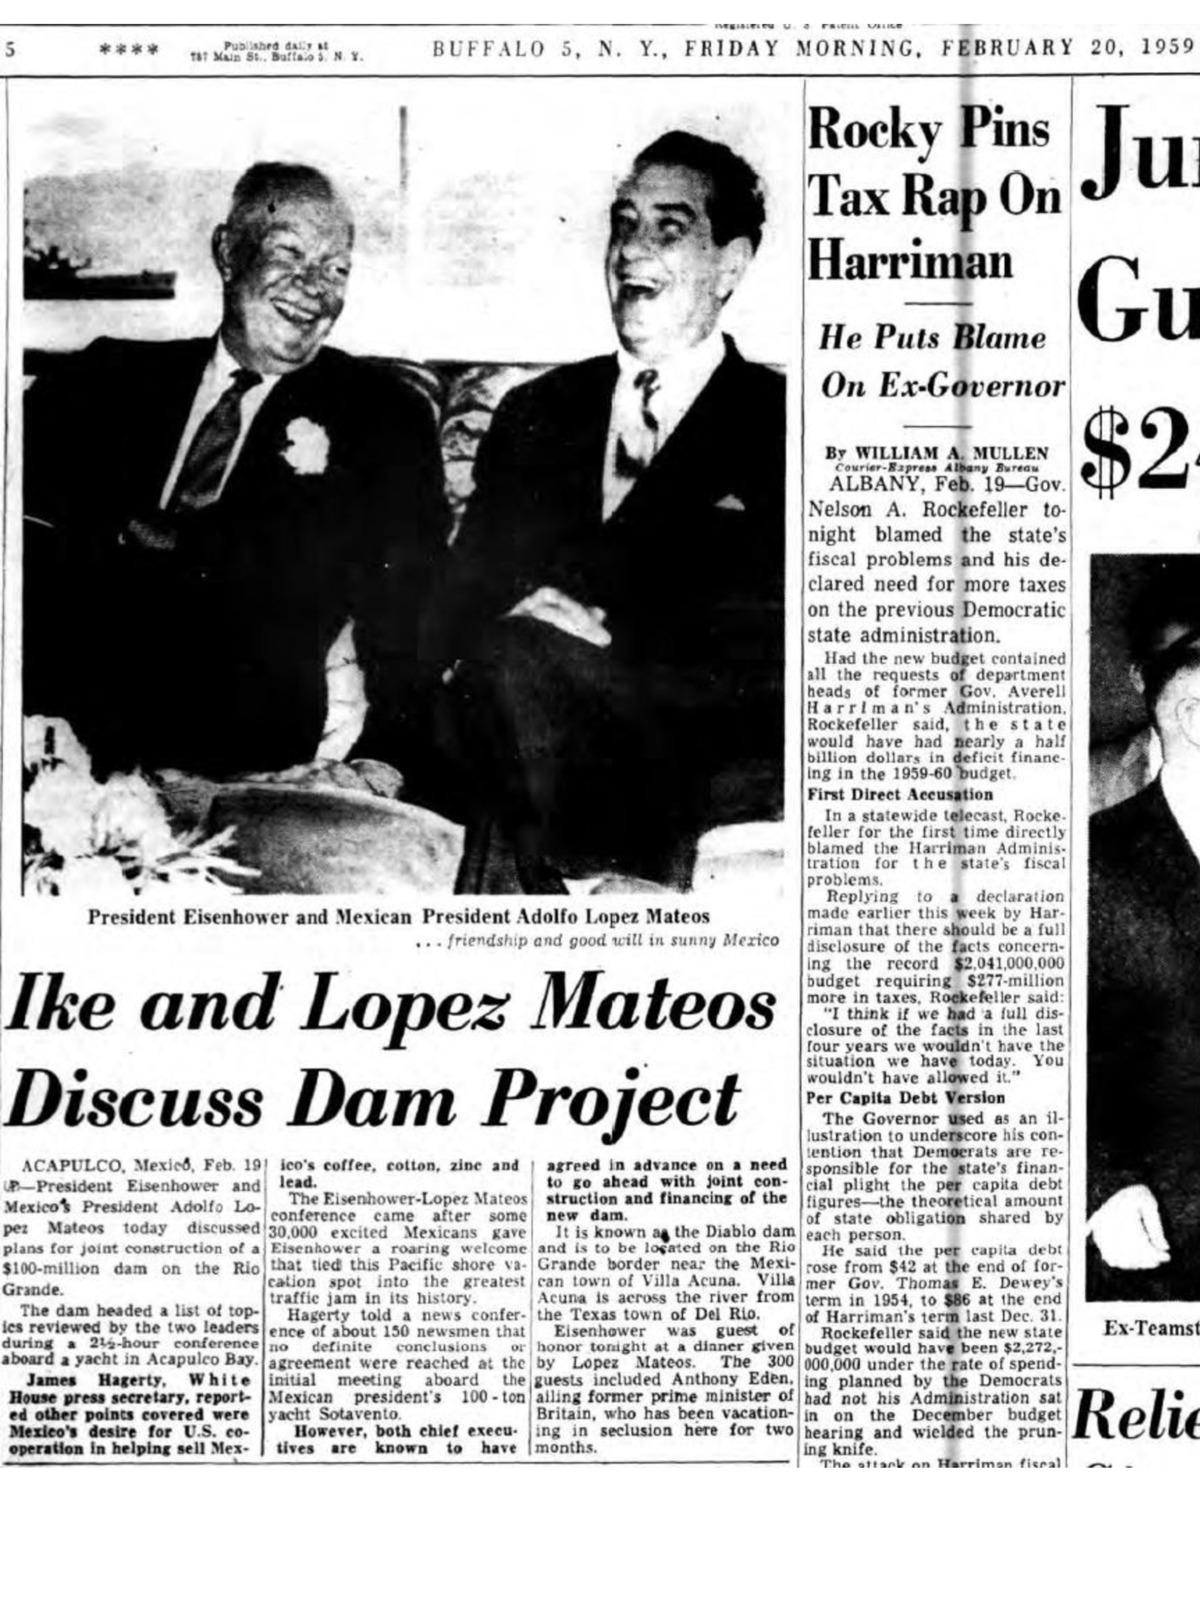 YATES PRESIDENCIALES – YATE SOTAVENTO – ARMADA DE MEXICO - 1948 Page_1_REUNION20_FEB1959_IKELOPEZMATEOS